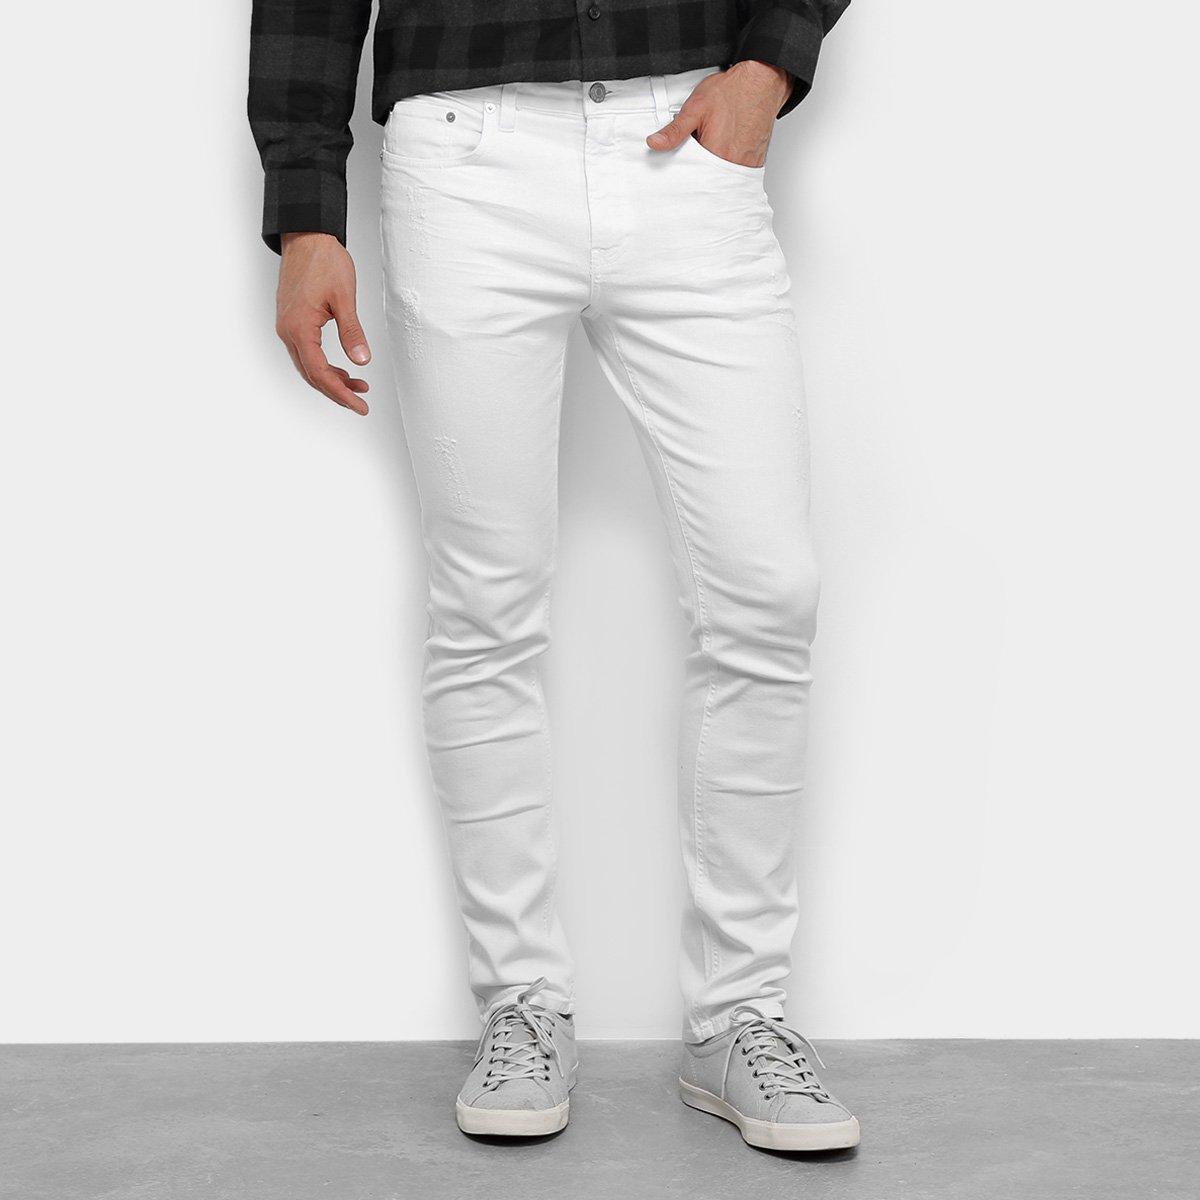 6480728c8 Calça Jeans Slim Calvin Klein Color Five Pockets Masculina